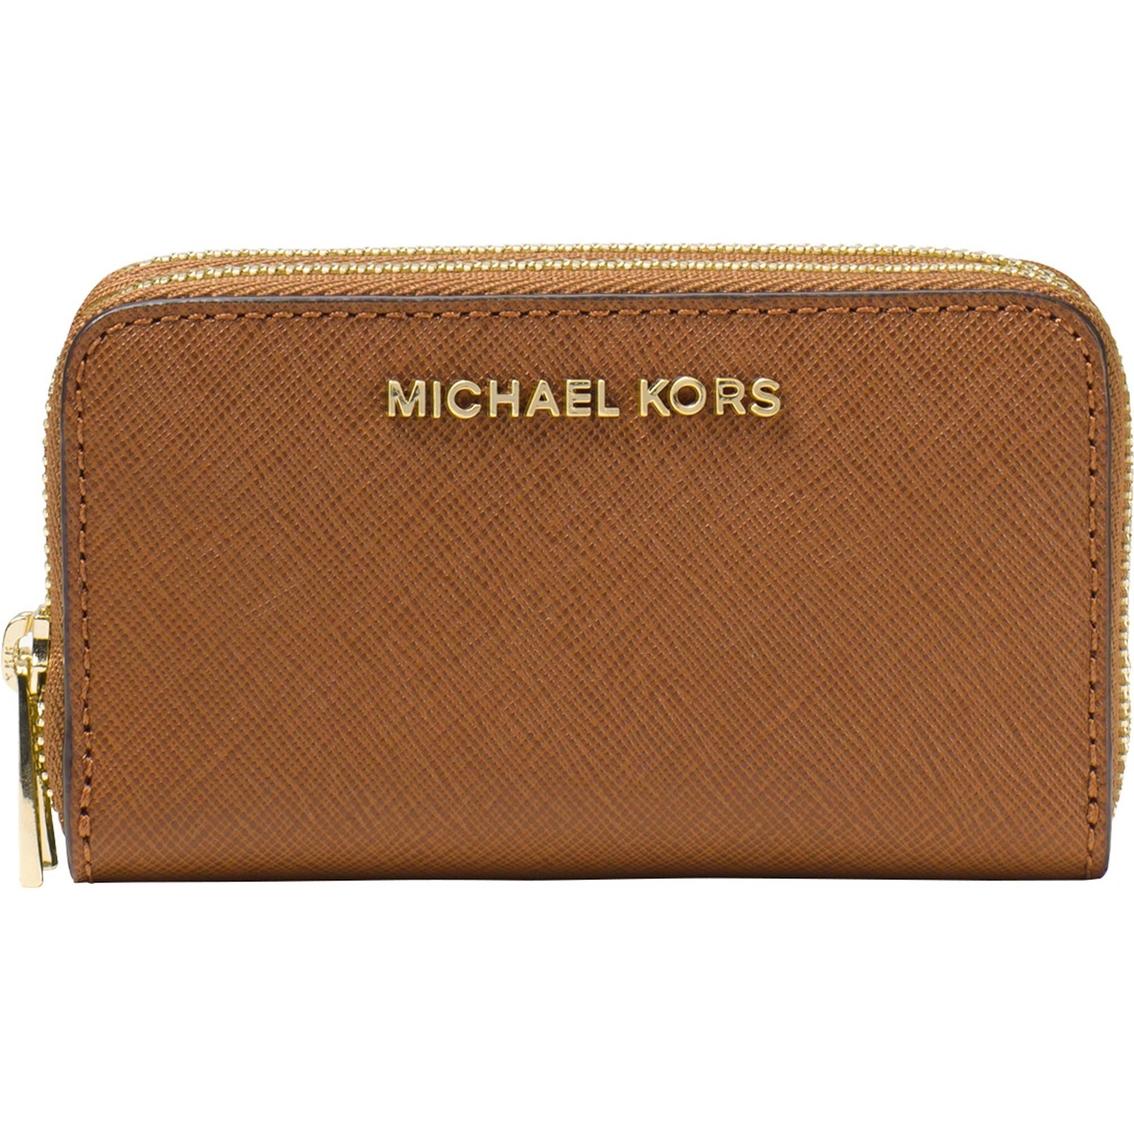 874523db78e7 Michael Kors Jet Set Travel Double Zip Around Card Holder | Wallets ...